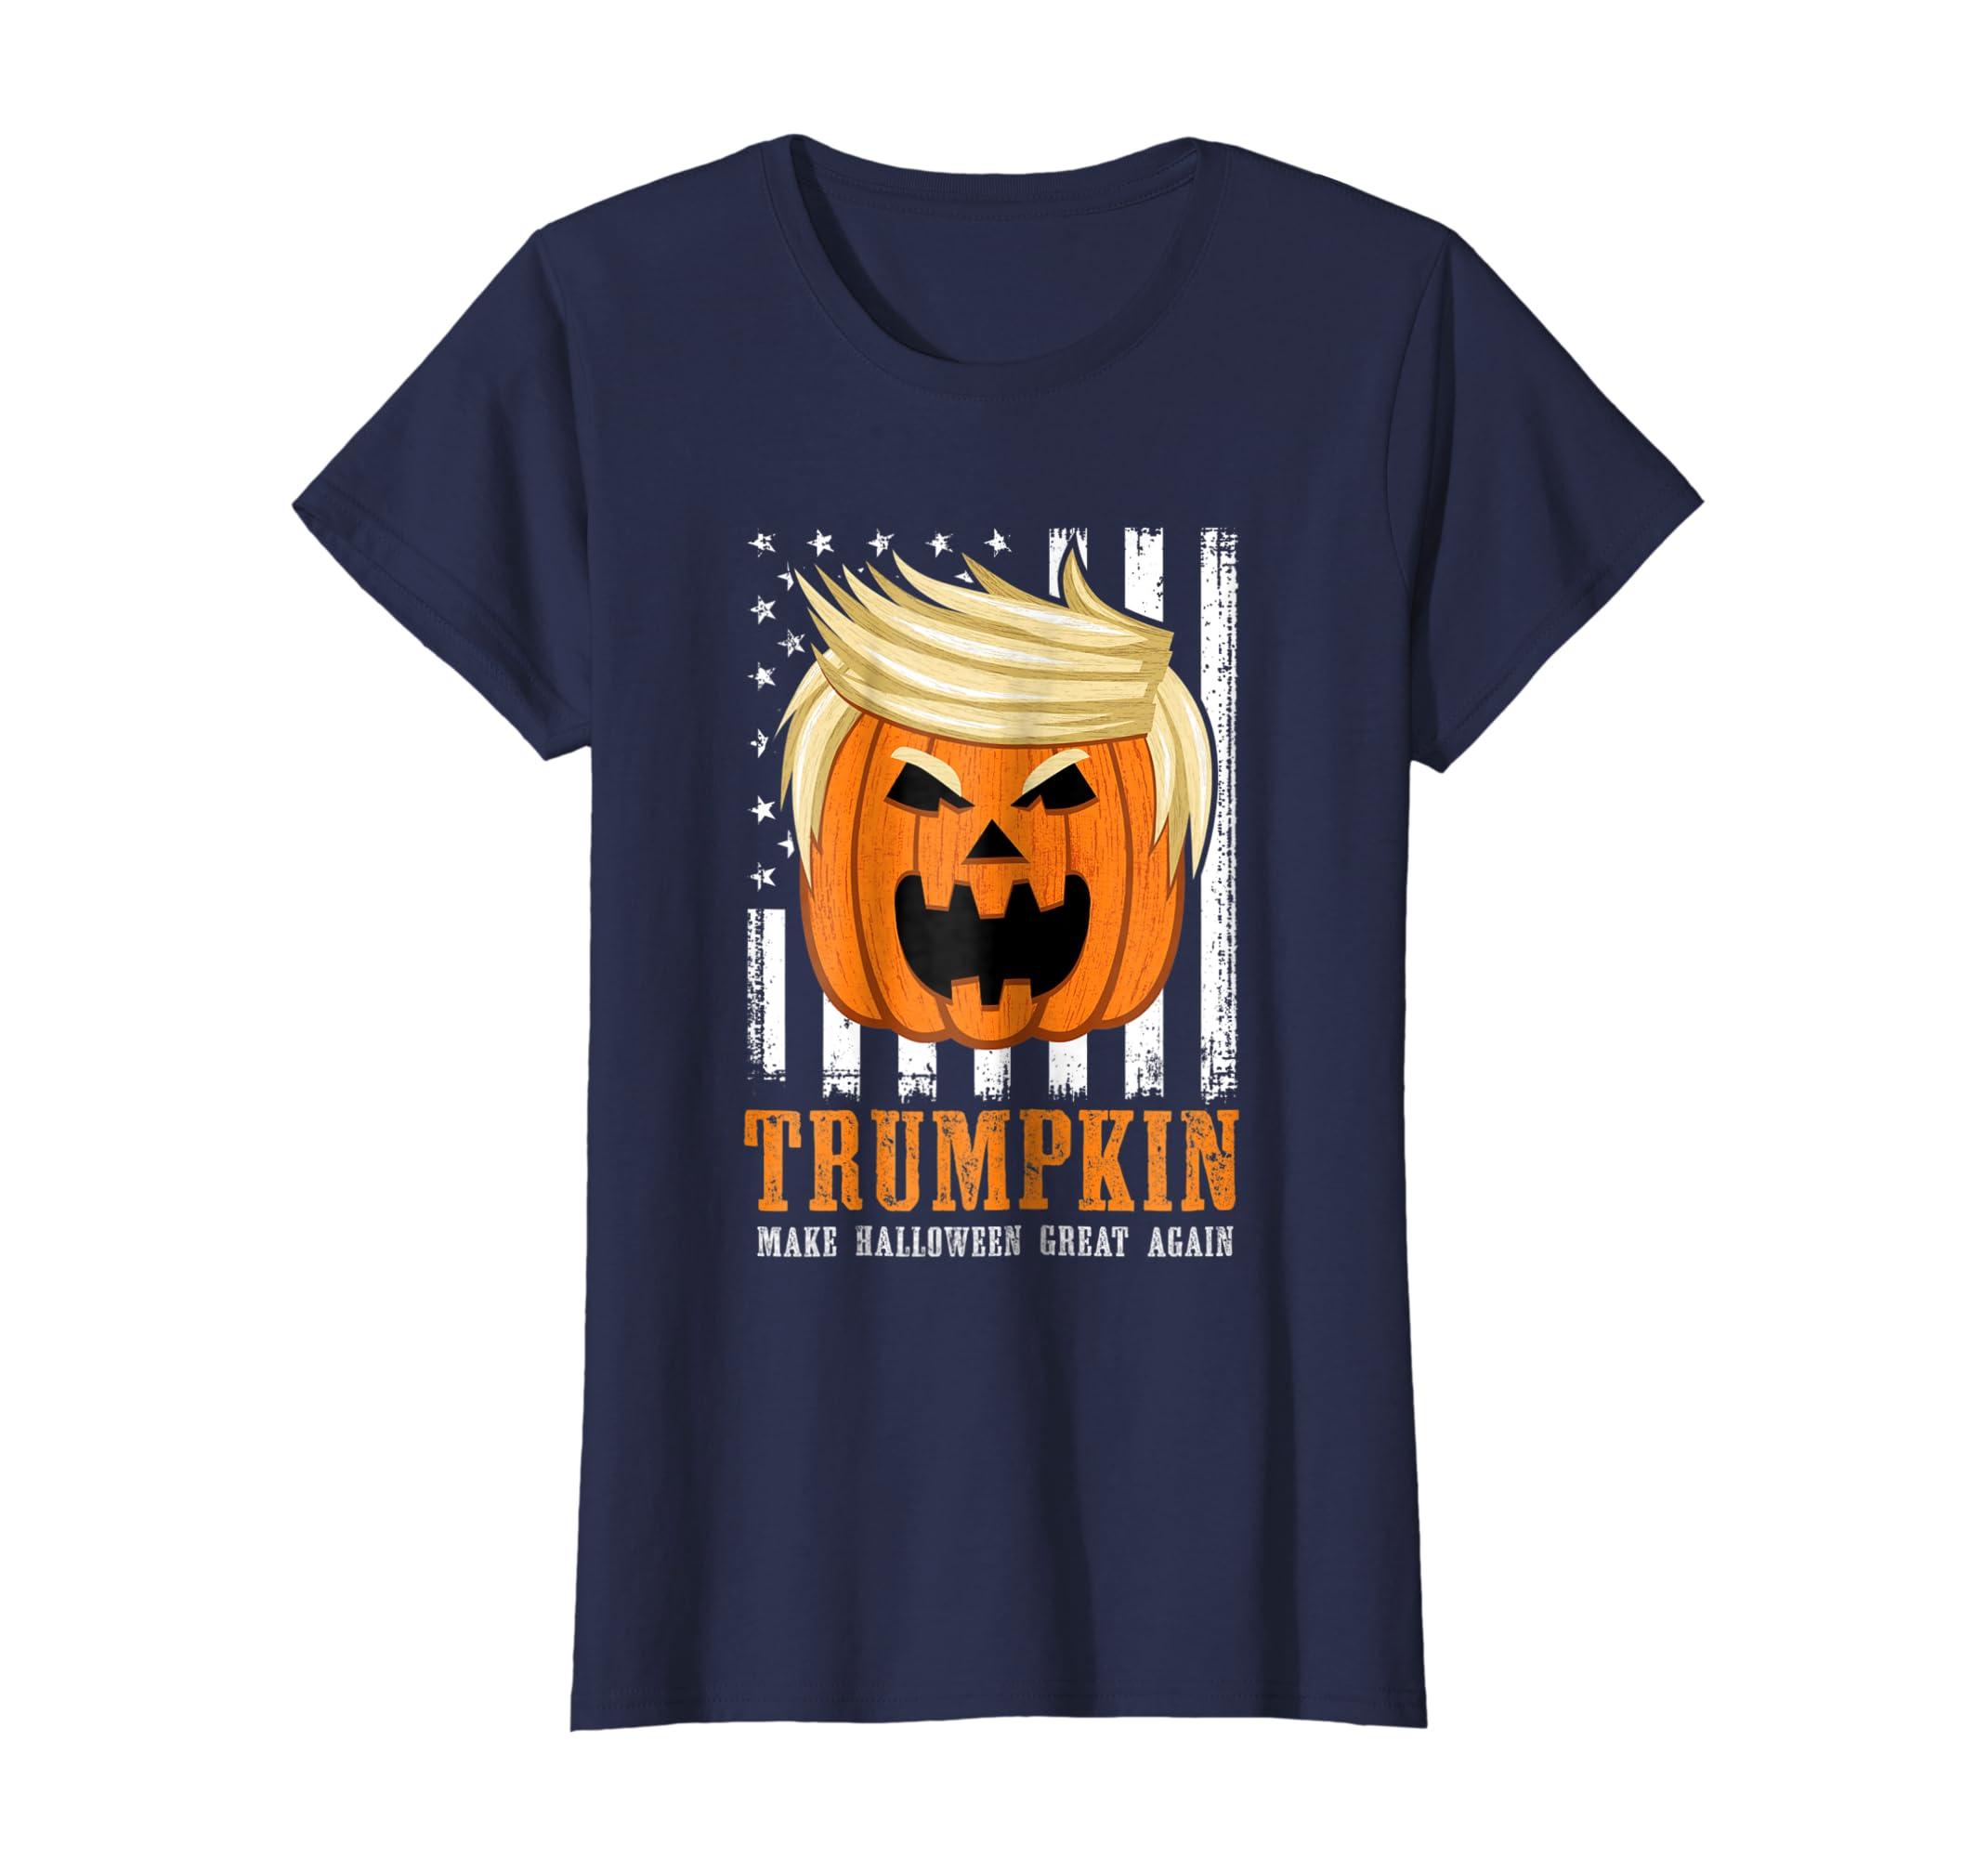 0611a4f71 Amazon.com: USA Trumpkin Make Halloween Great Again Funny T-Shirt: Clothing